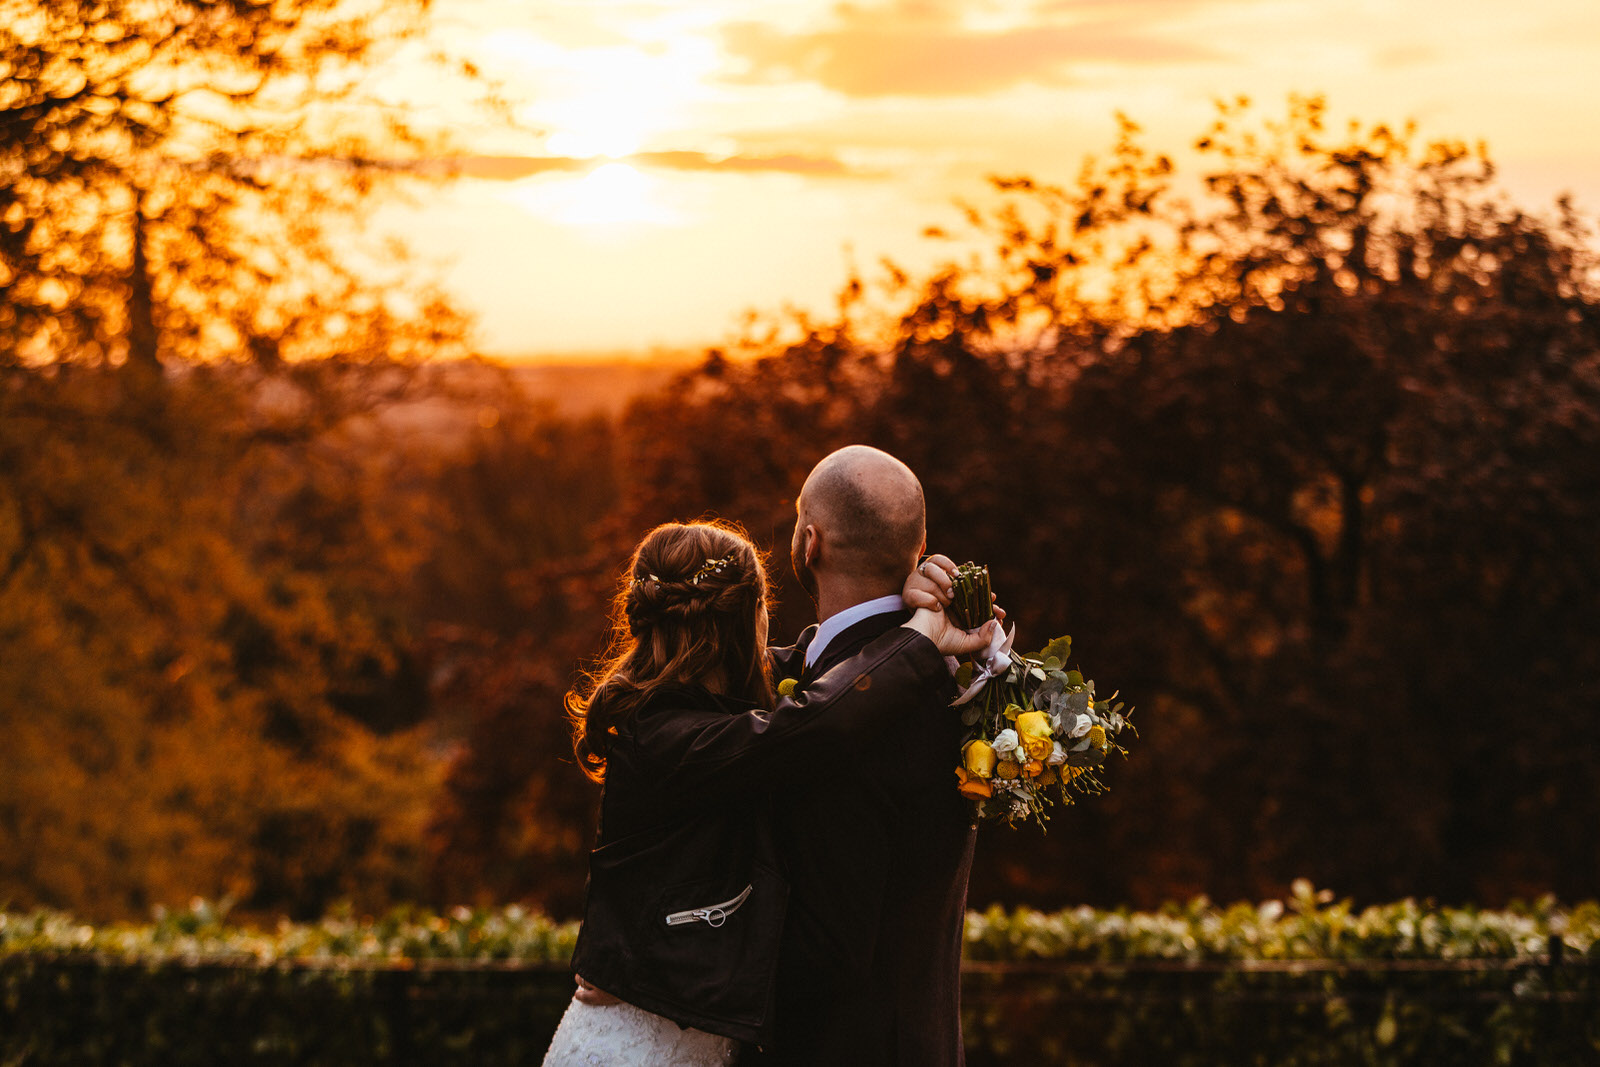 Jenni-and-James-Wedding-Highlights-49.jpg